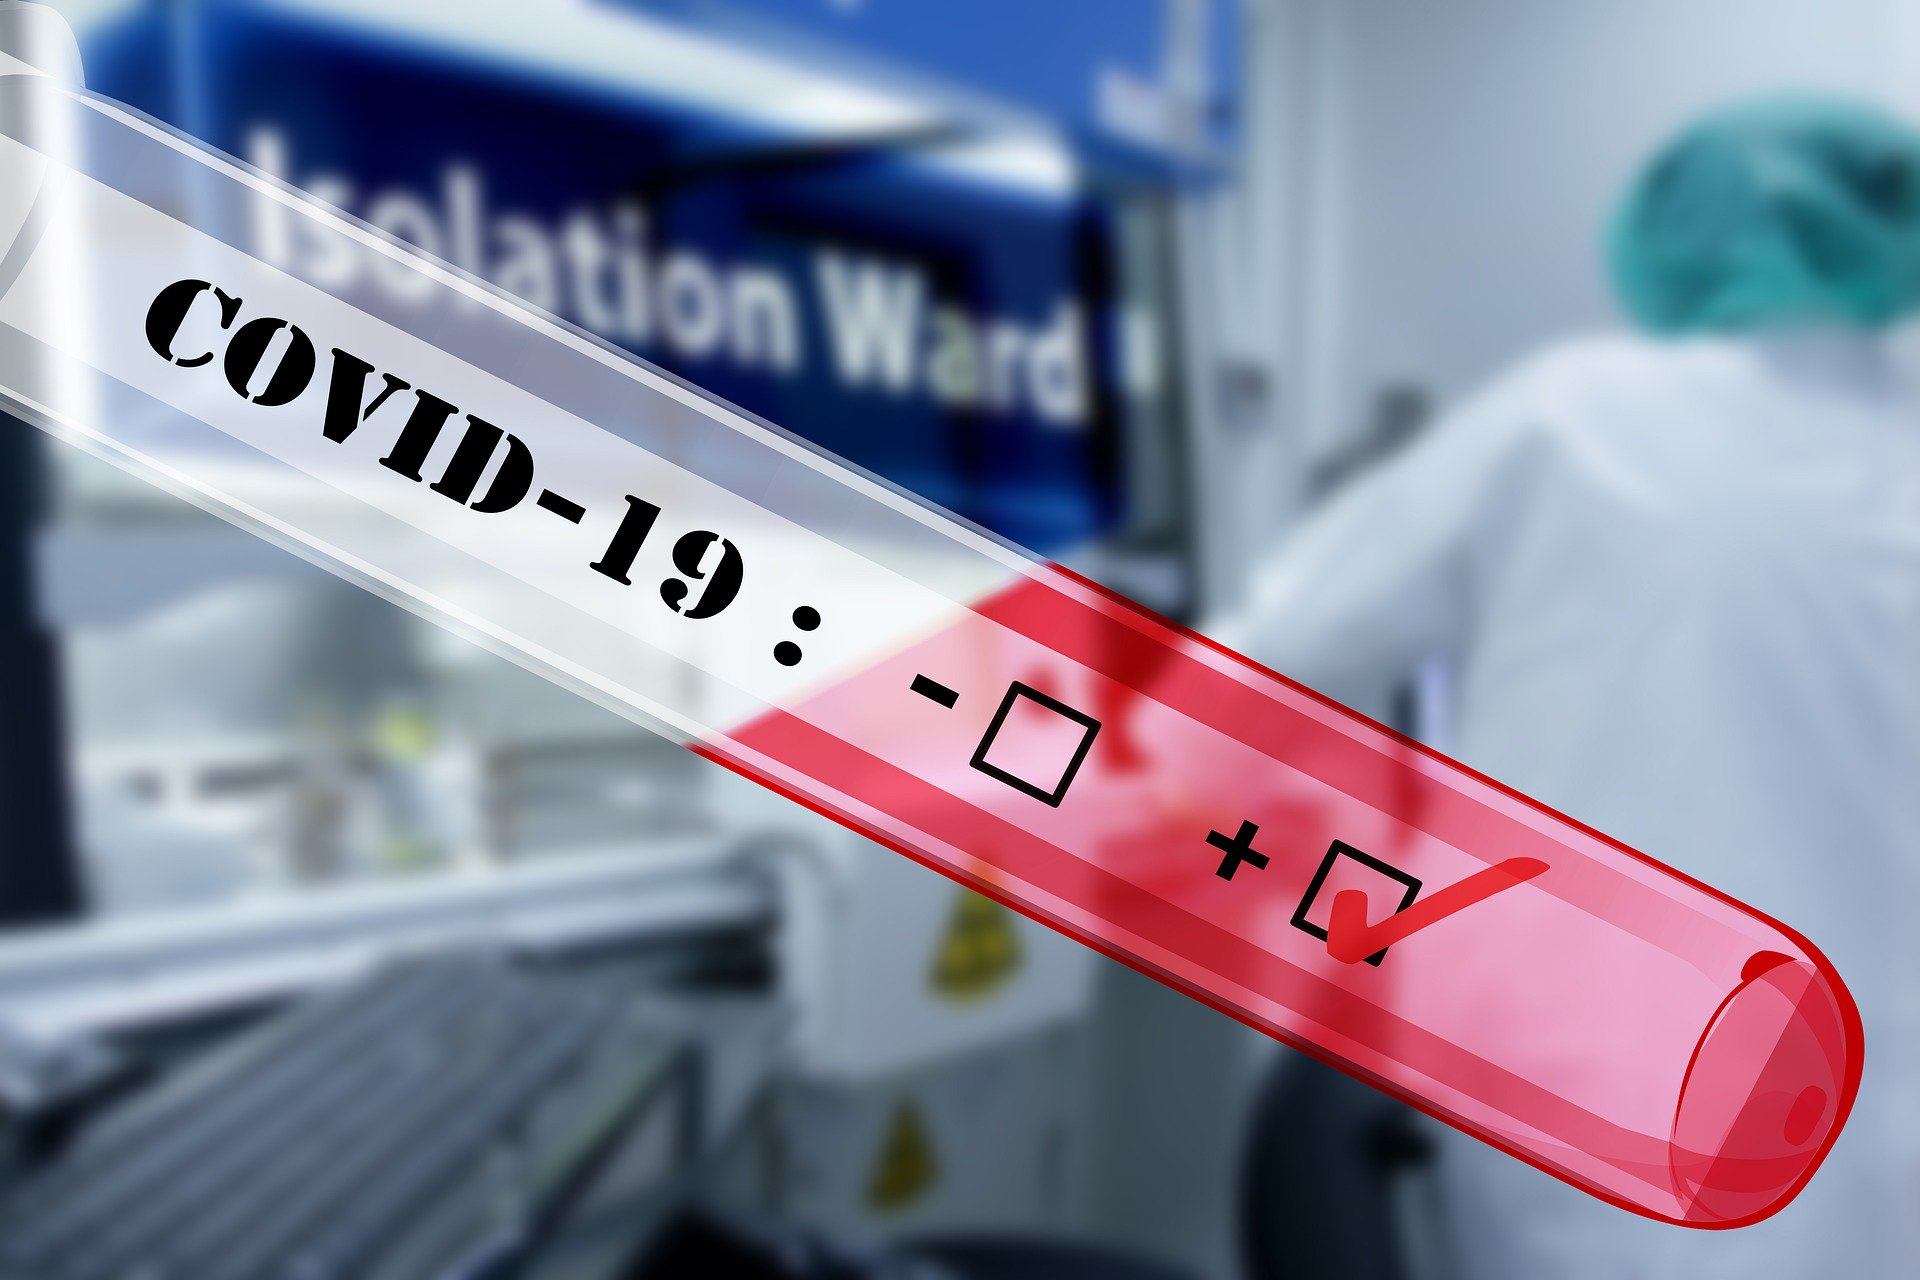 Why Pasadena tested so few people for coronavirus